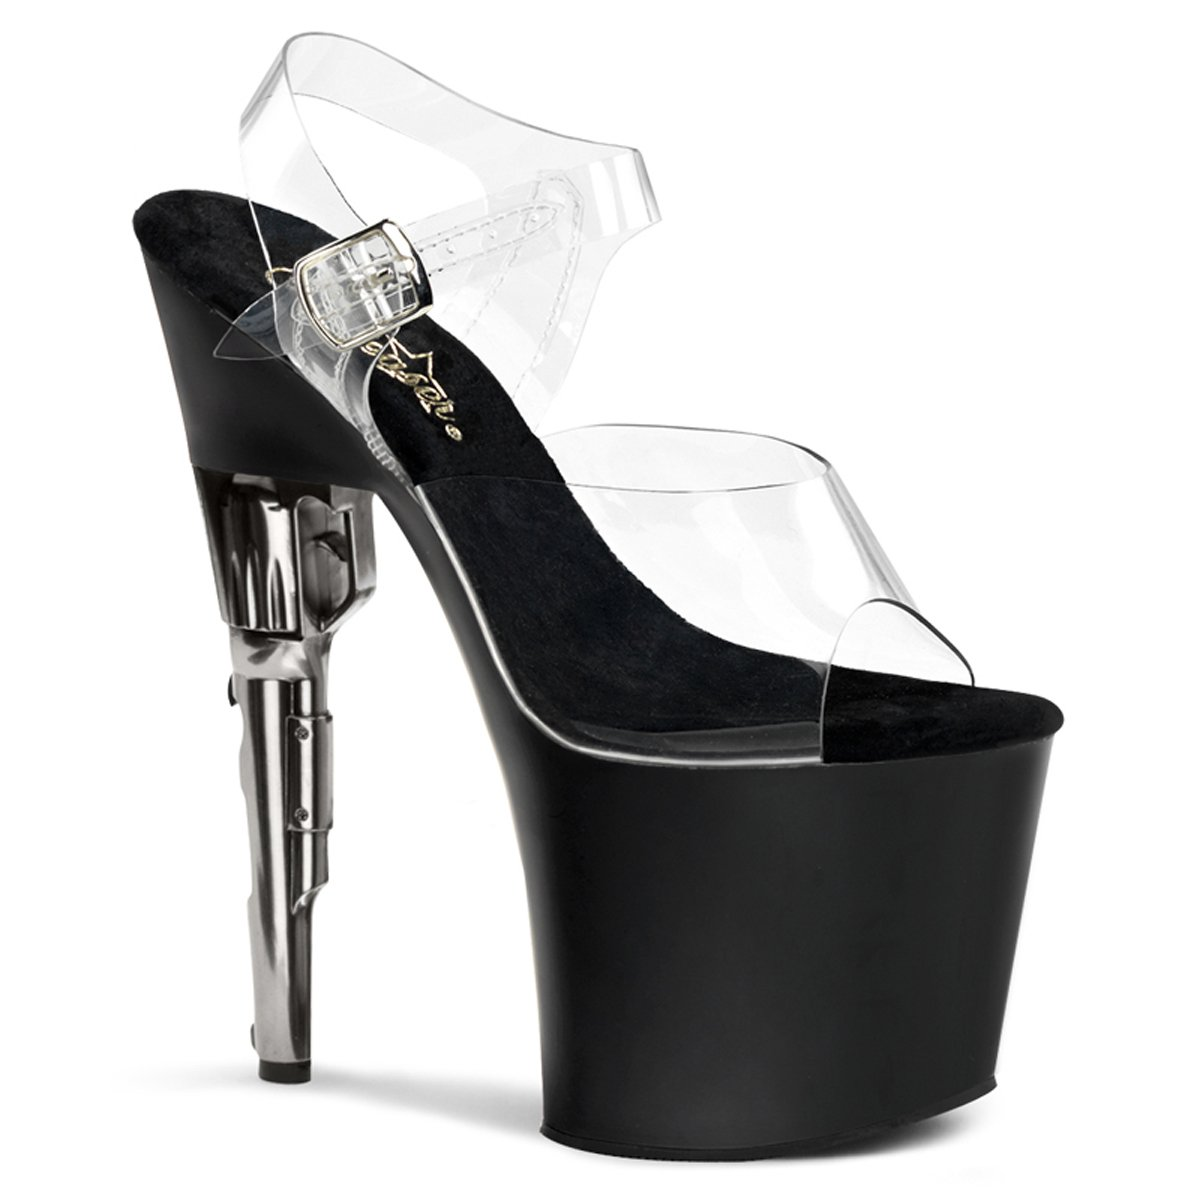 Pleaser Women's Bondgirl-708 Platform Sandal B004MR6B0K 12 B(M) US|Clr